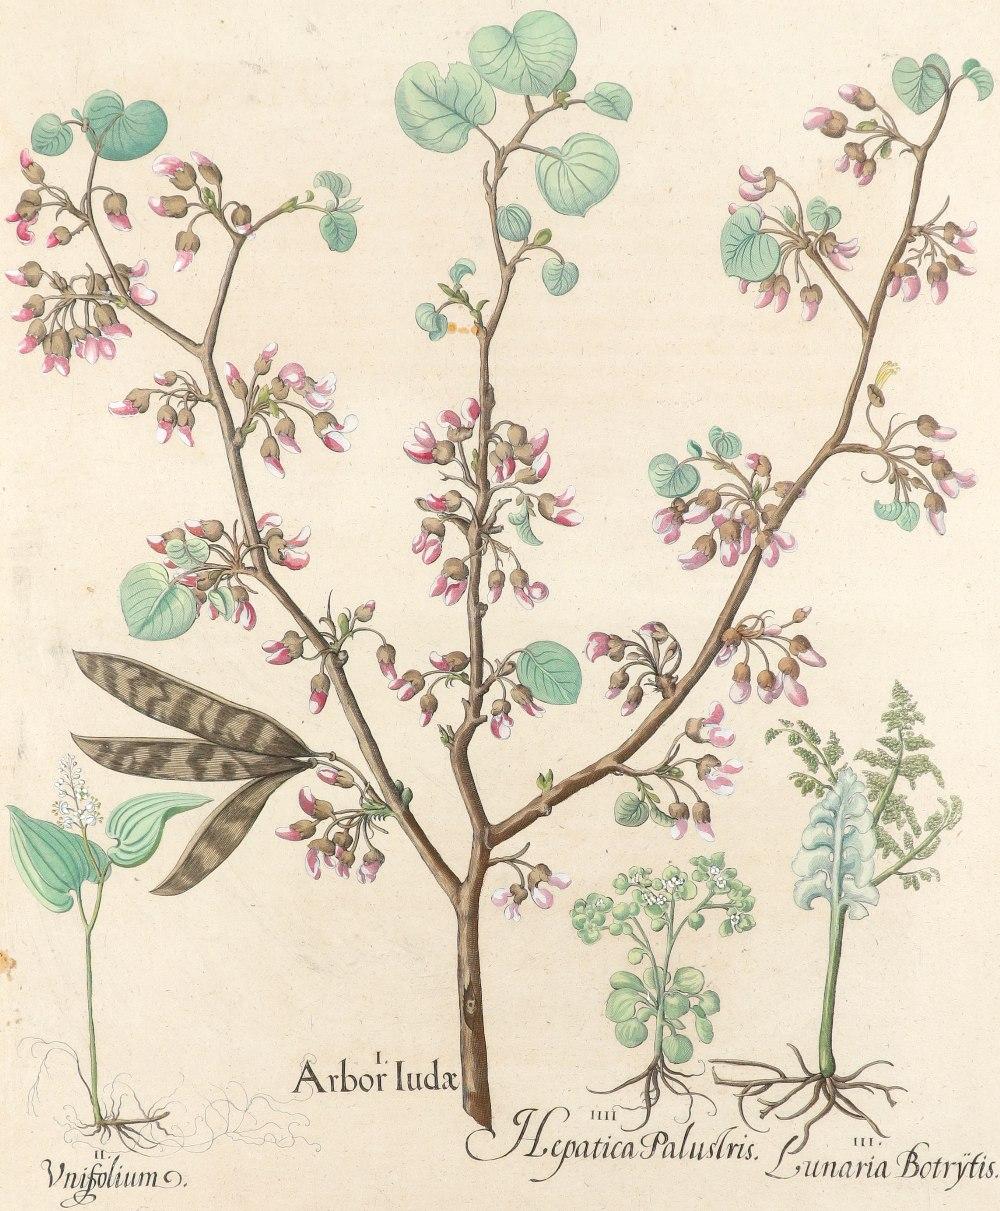 After Basilius Besler Poma flore multiplici; Aquilegia stellata flore vio laceo; Cytisus - Image 13 of 36